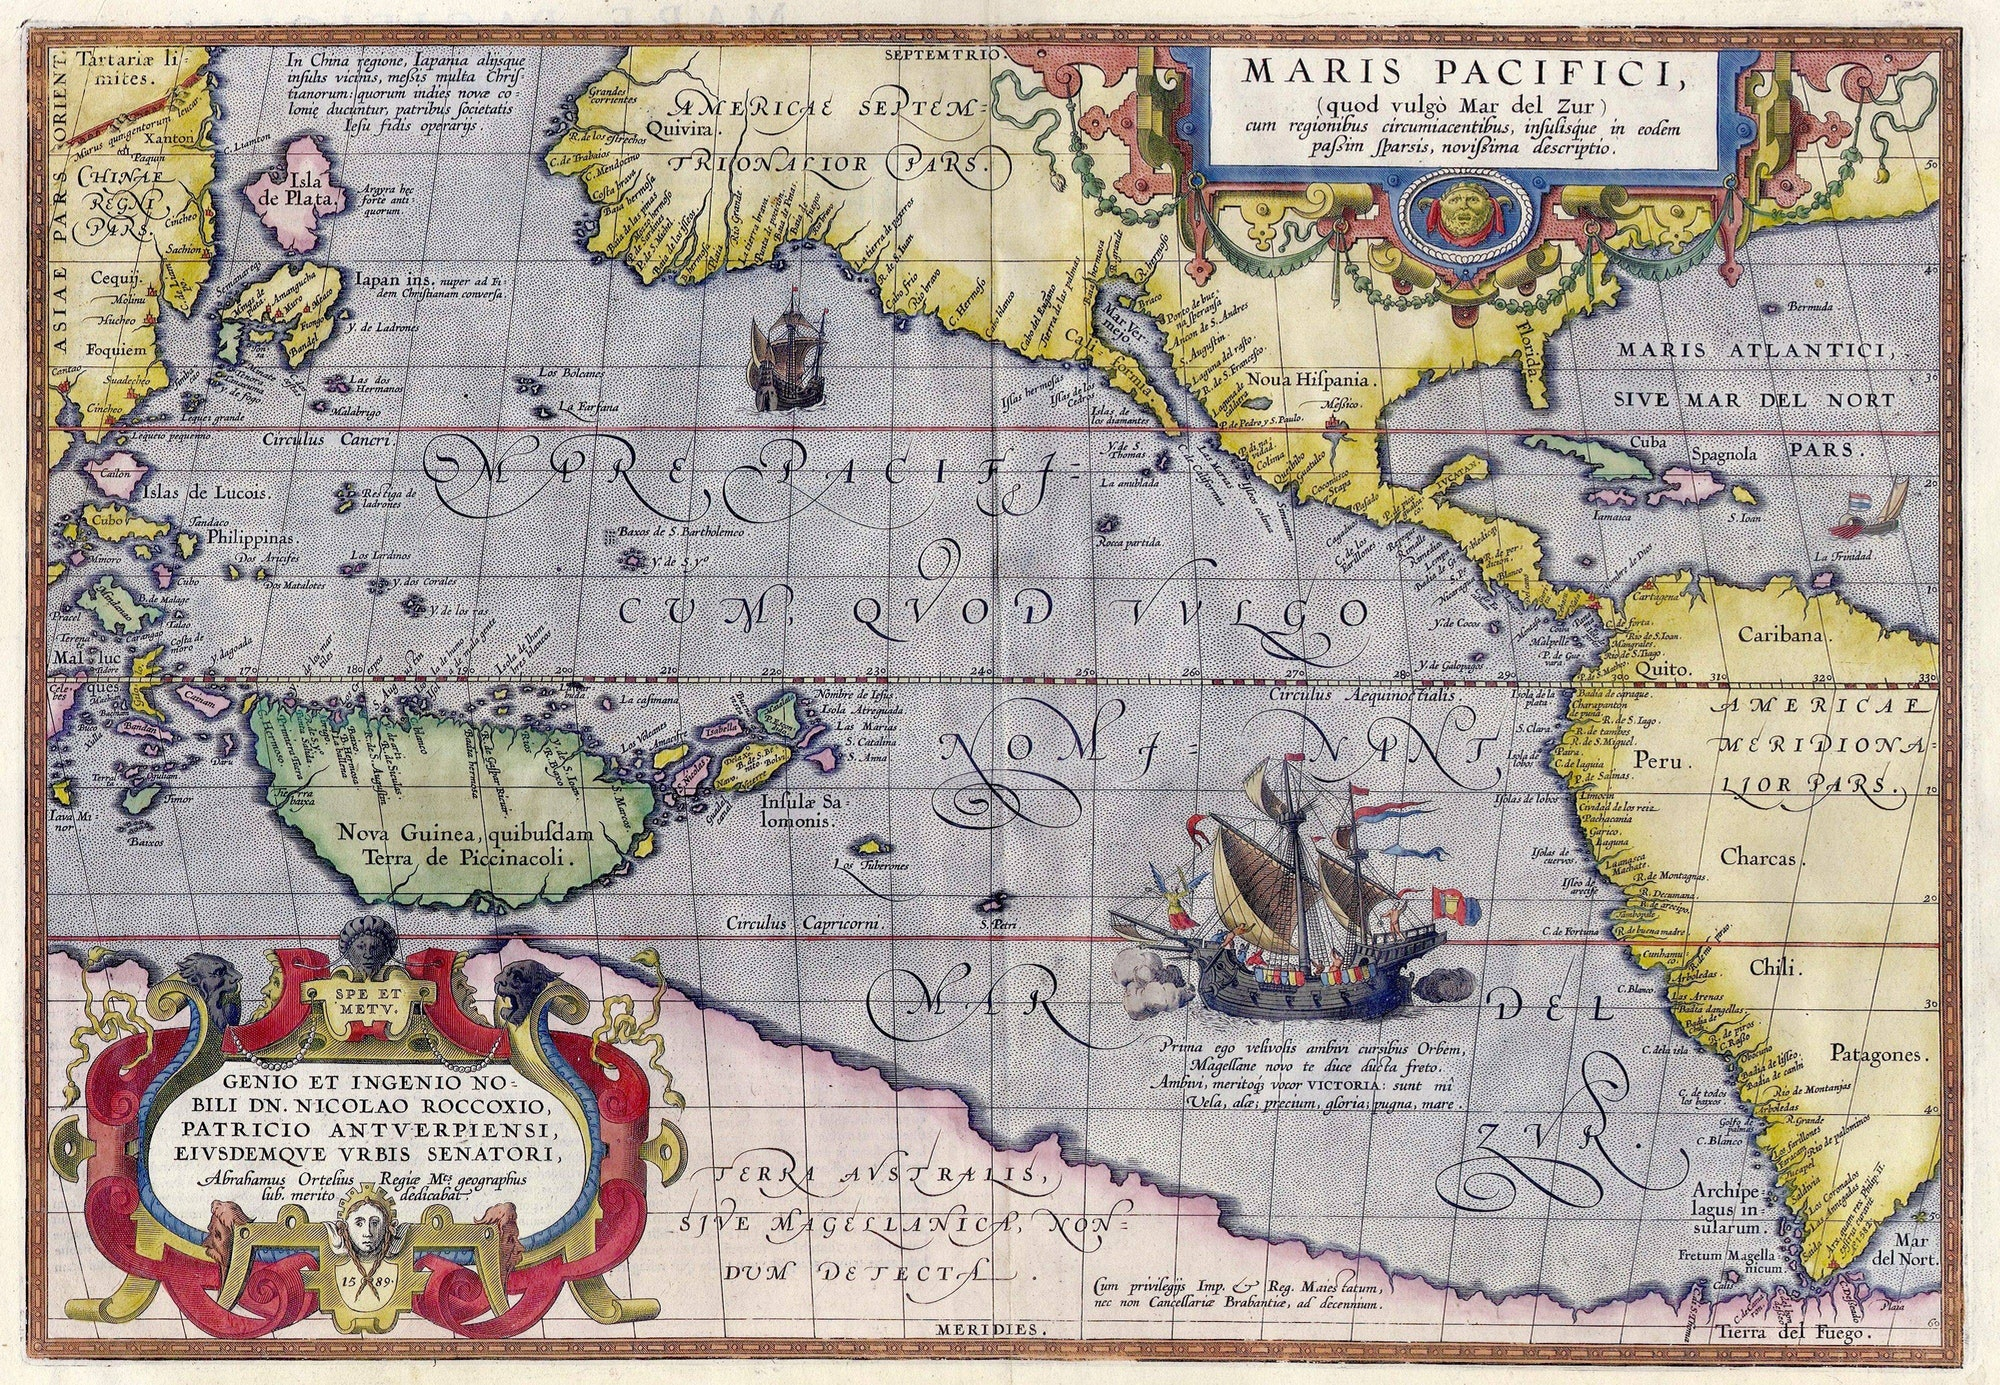 Abraham Ortelius map of the Pacific